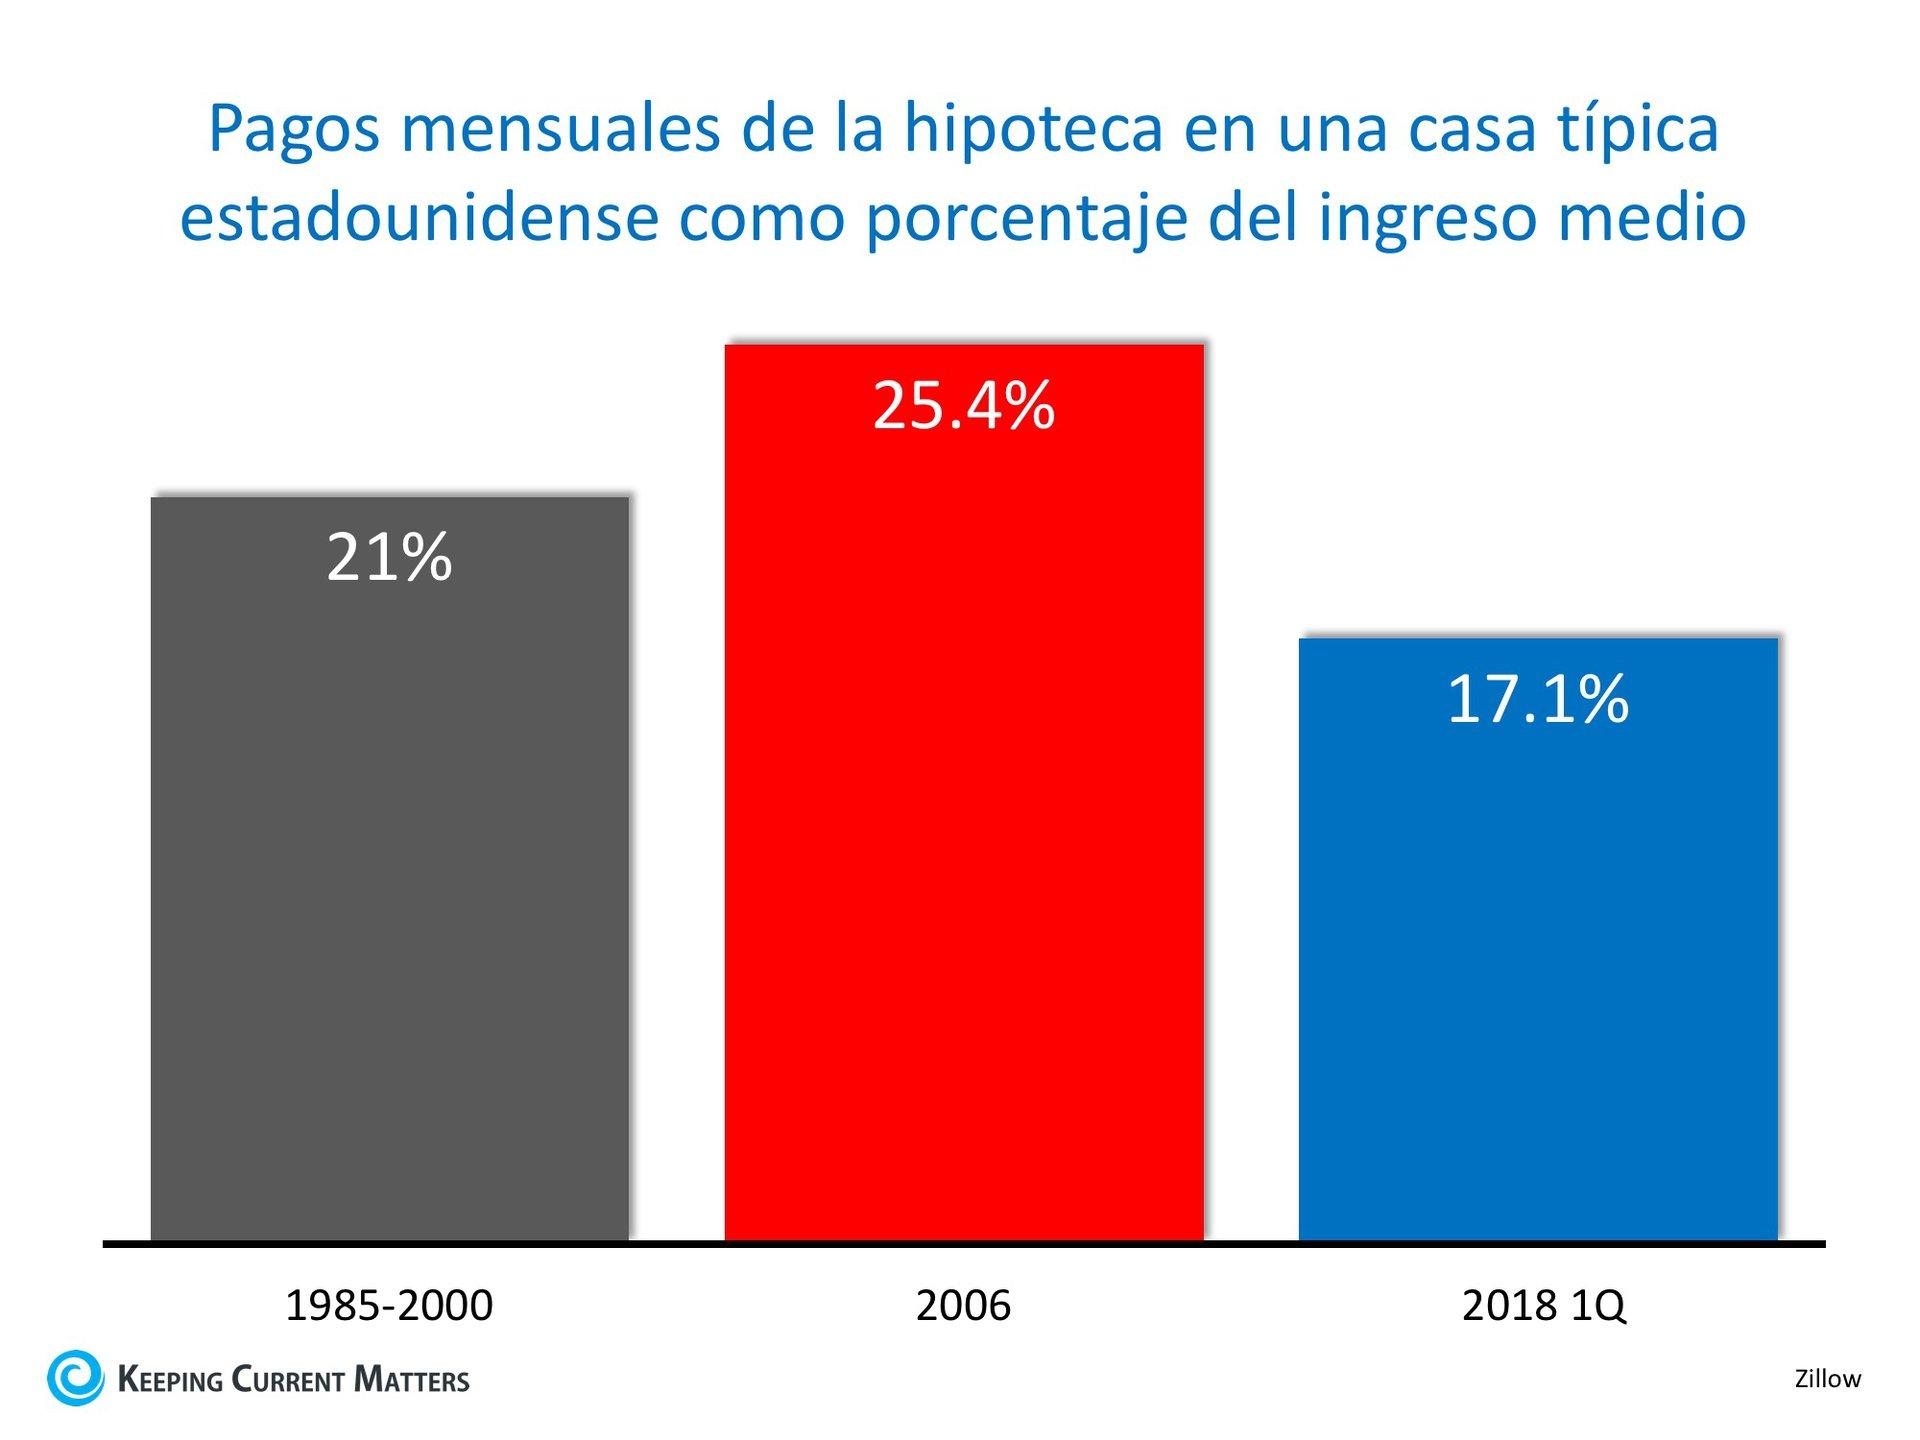 Las casas están más asequibles hoy que de 1985 a 2000 | Keeping Current Matters